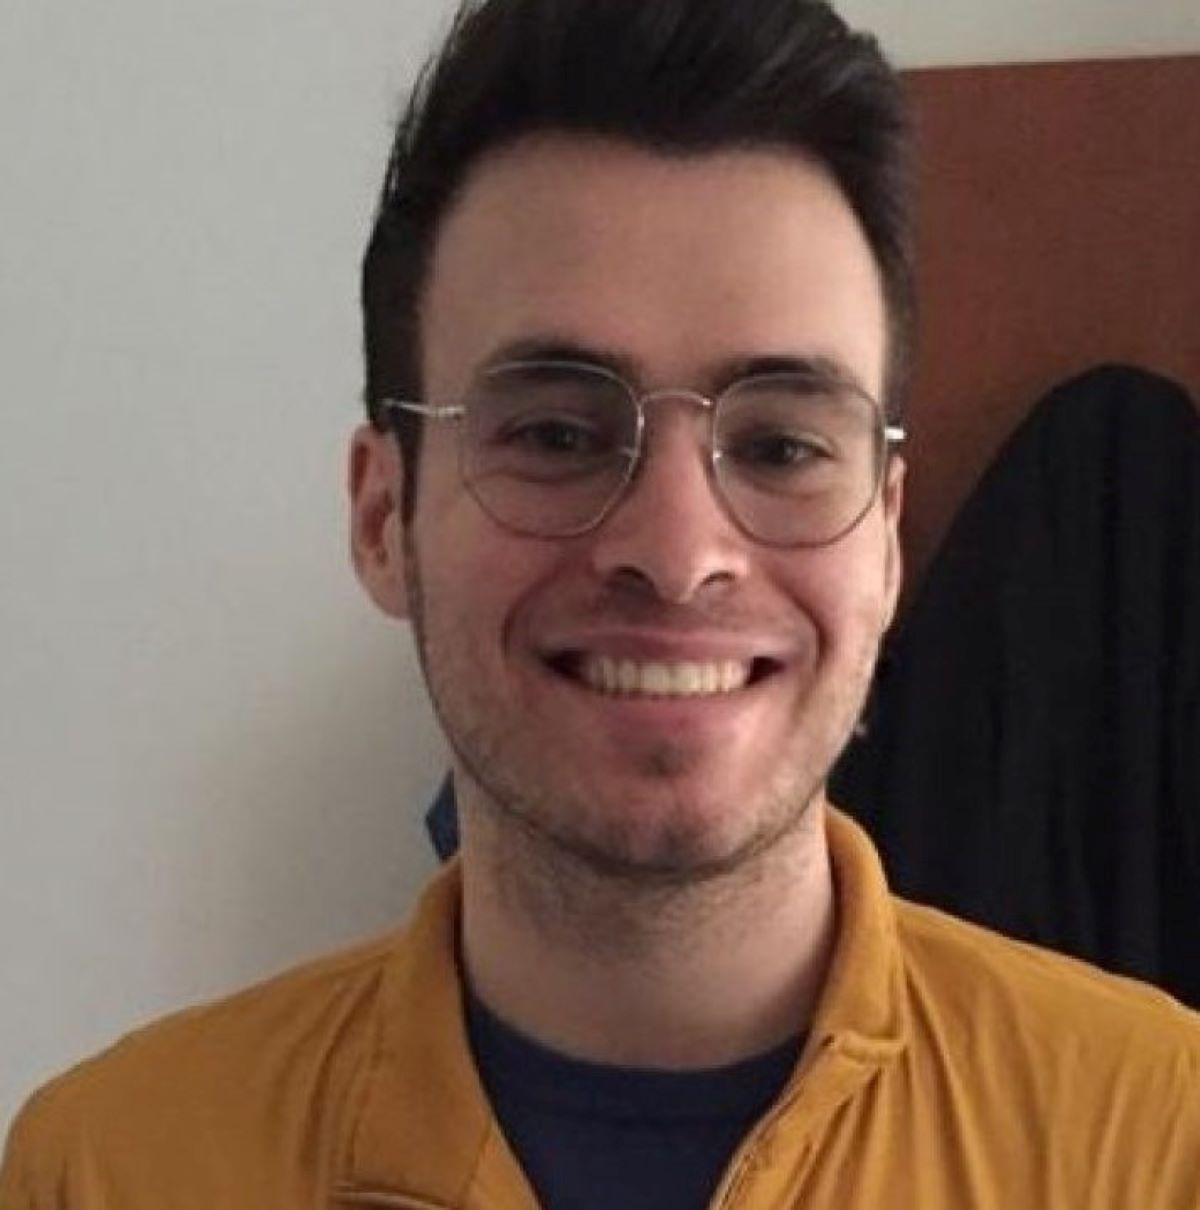 Francesco Pantaleo Morto Pisa Scomparso Corpo Carbonizzato